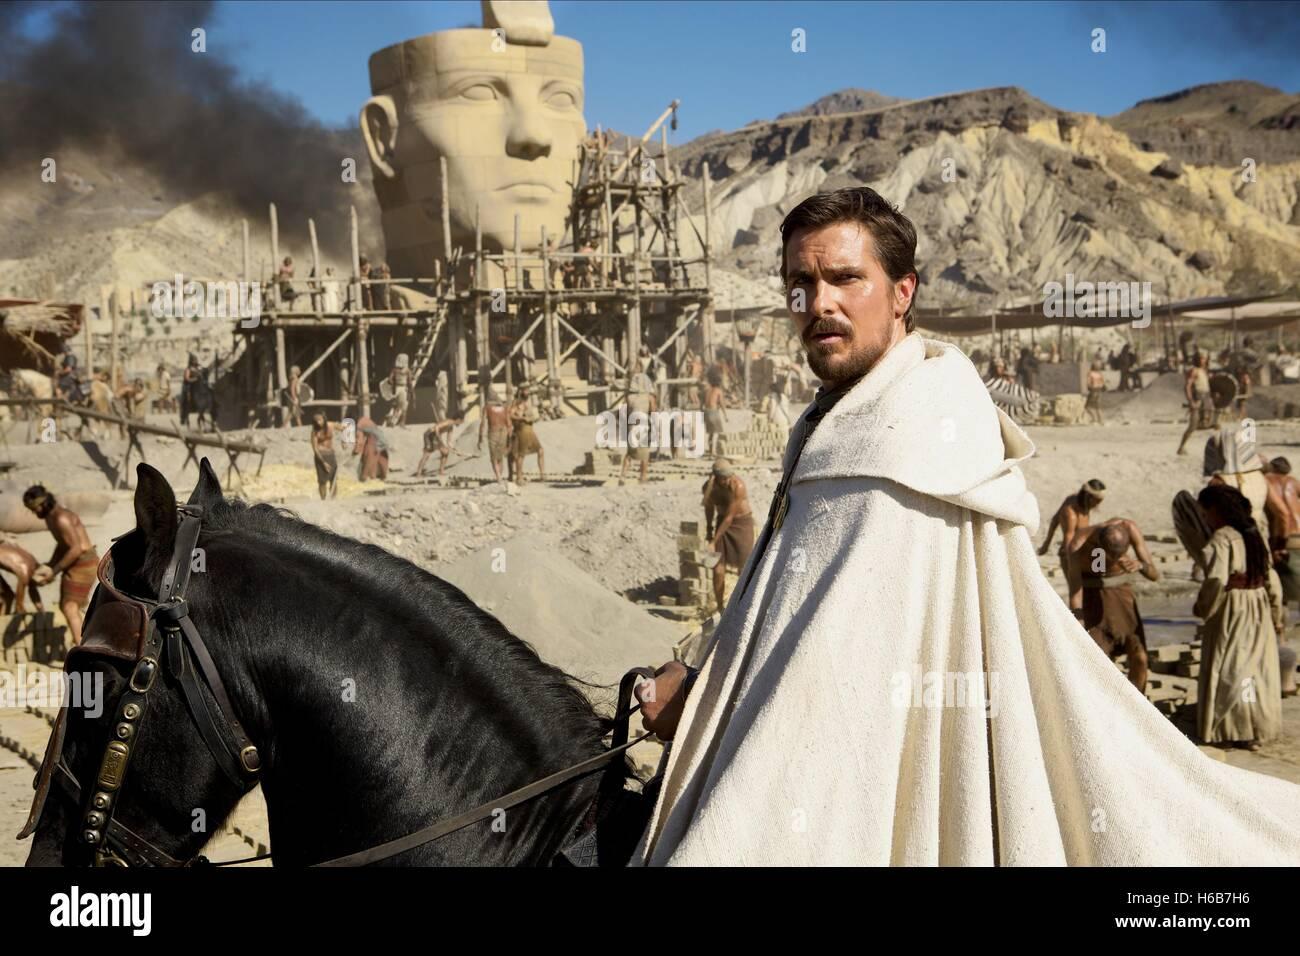 Christian Bale Exodus Gods And Kings 2014 Stock Photo Alamy